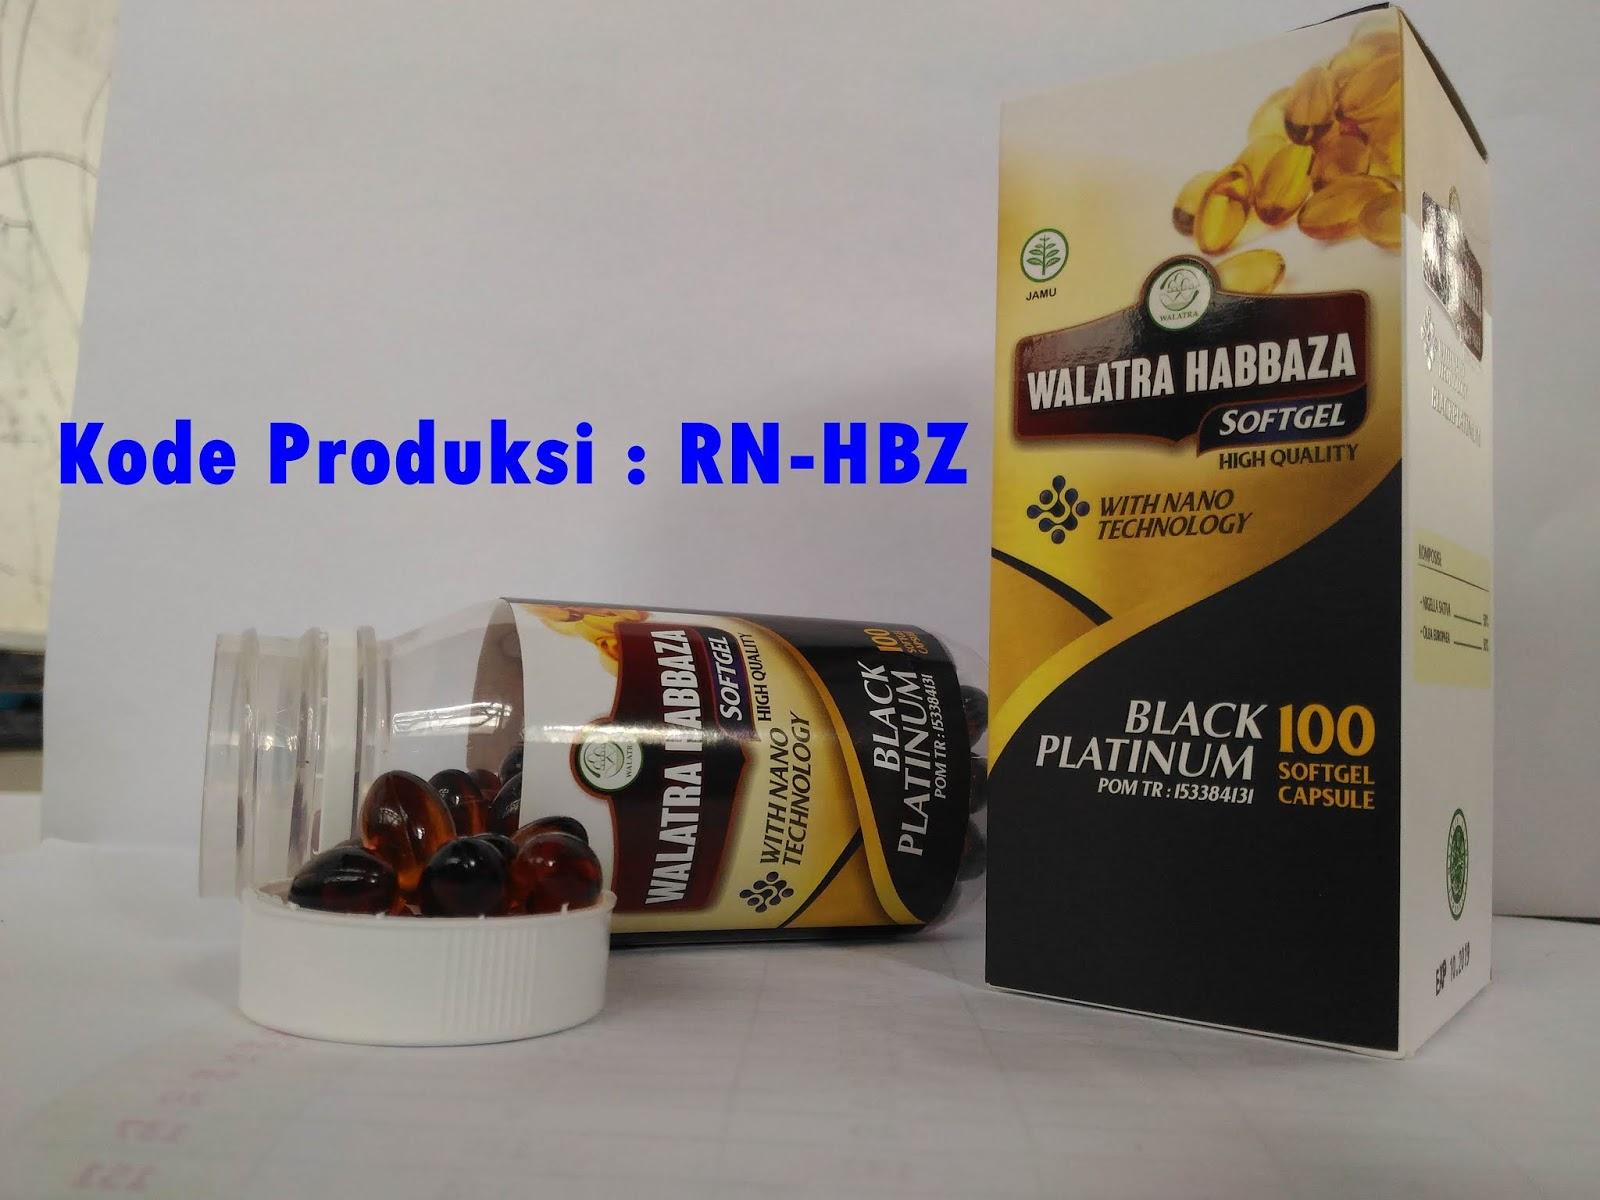 Nama Merk Minyak Zaitun Asli di Apotik Untuk Di Minum ...